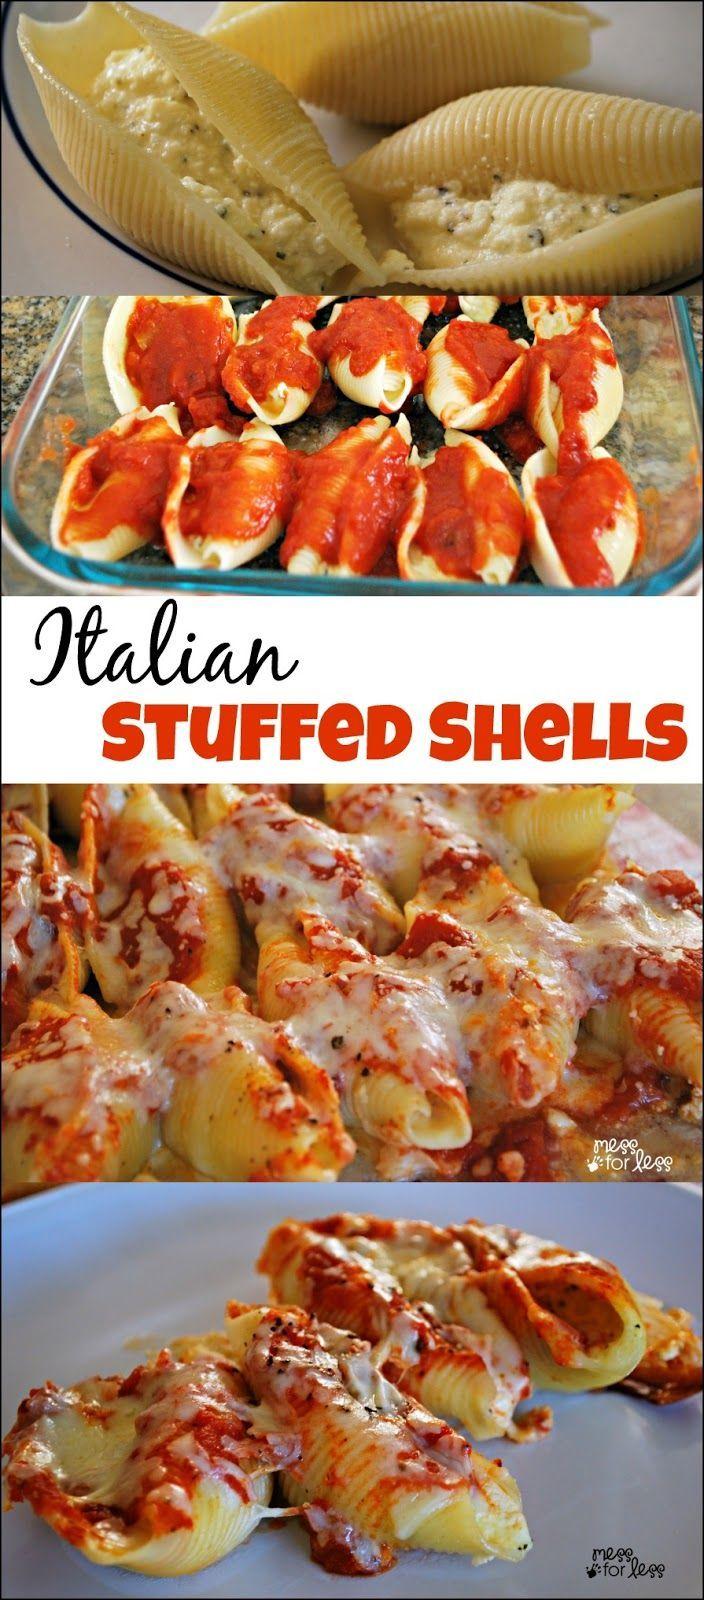 Stuffed Shells Recipe – A simple take on a classic Italian dish. These are a delic